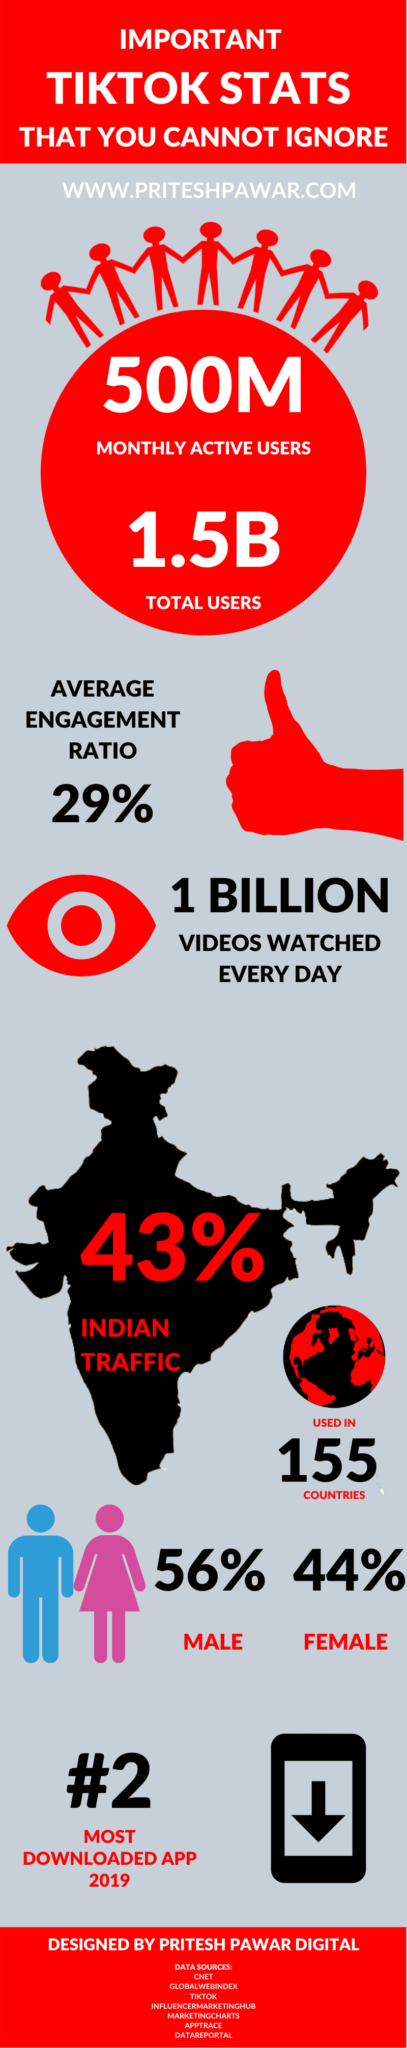 Infographic for TikTok Stats 2020